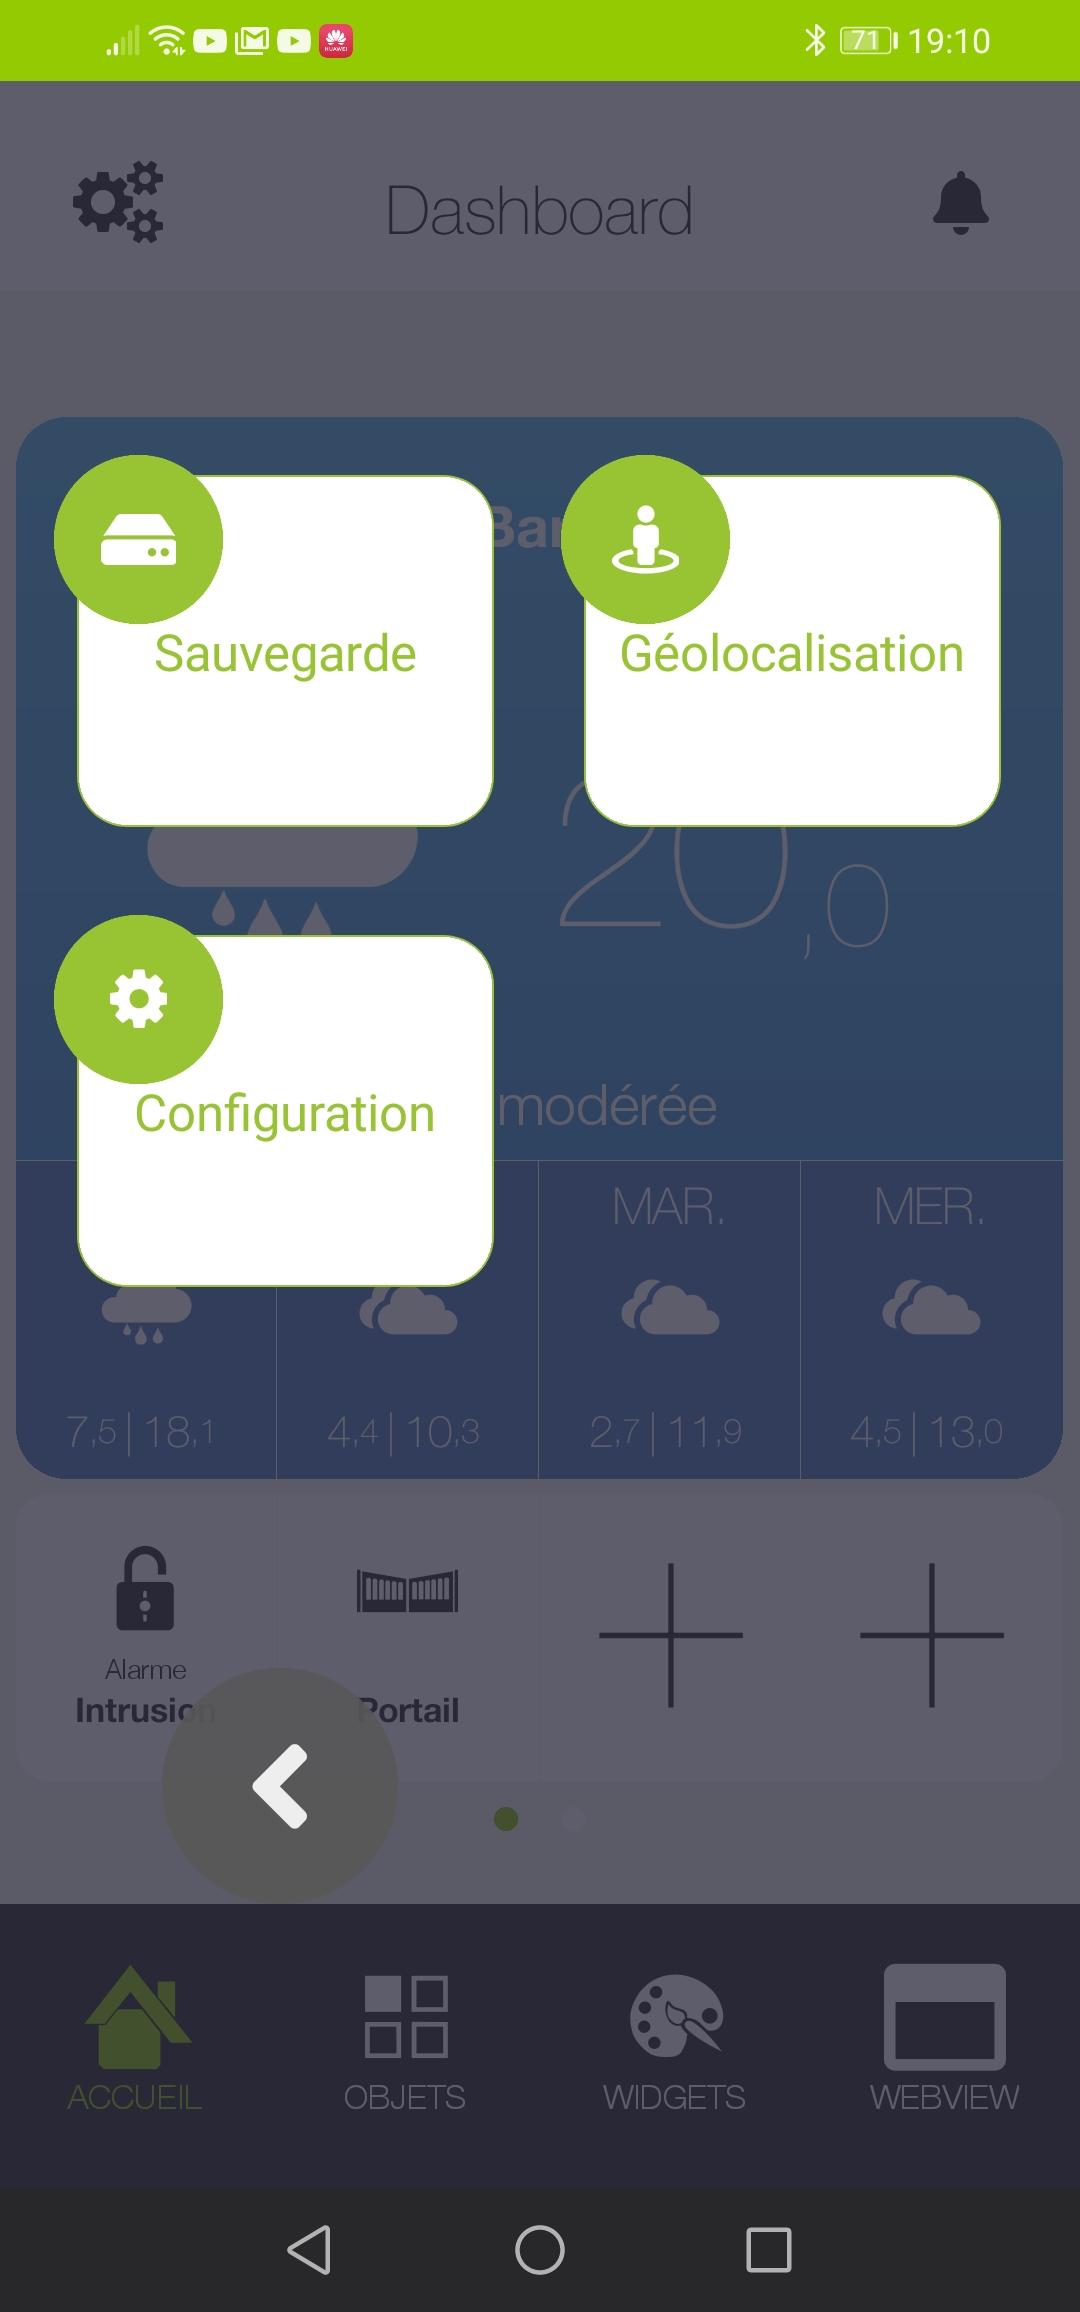 Screenshot_20200509_191031_fr.jeedom.jeedom